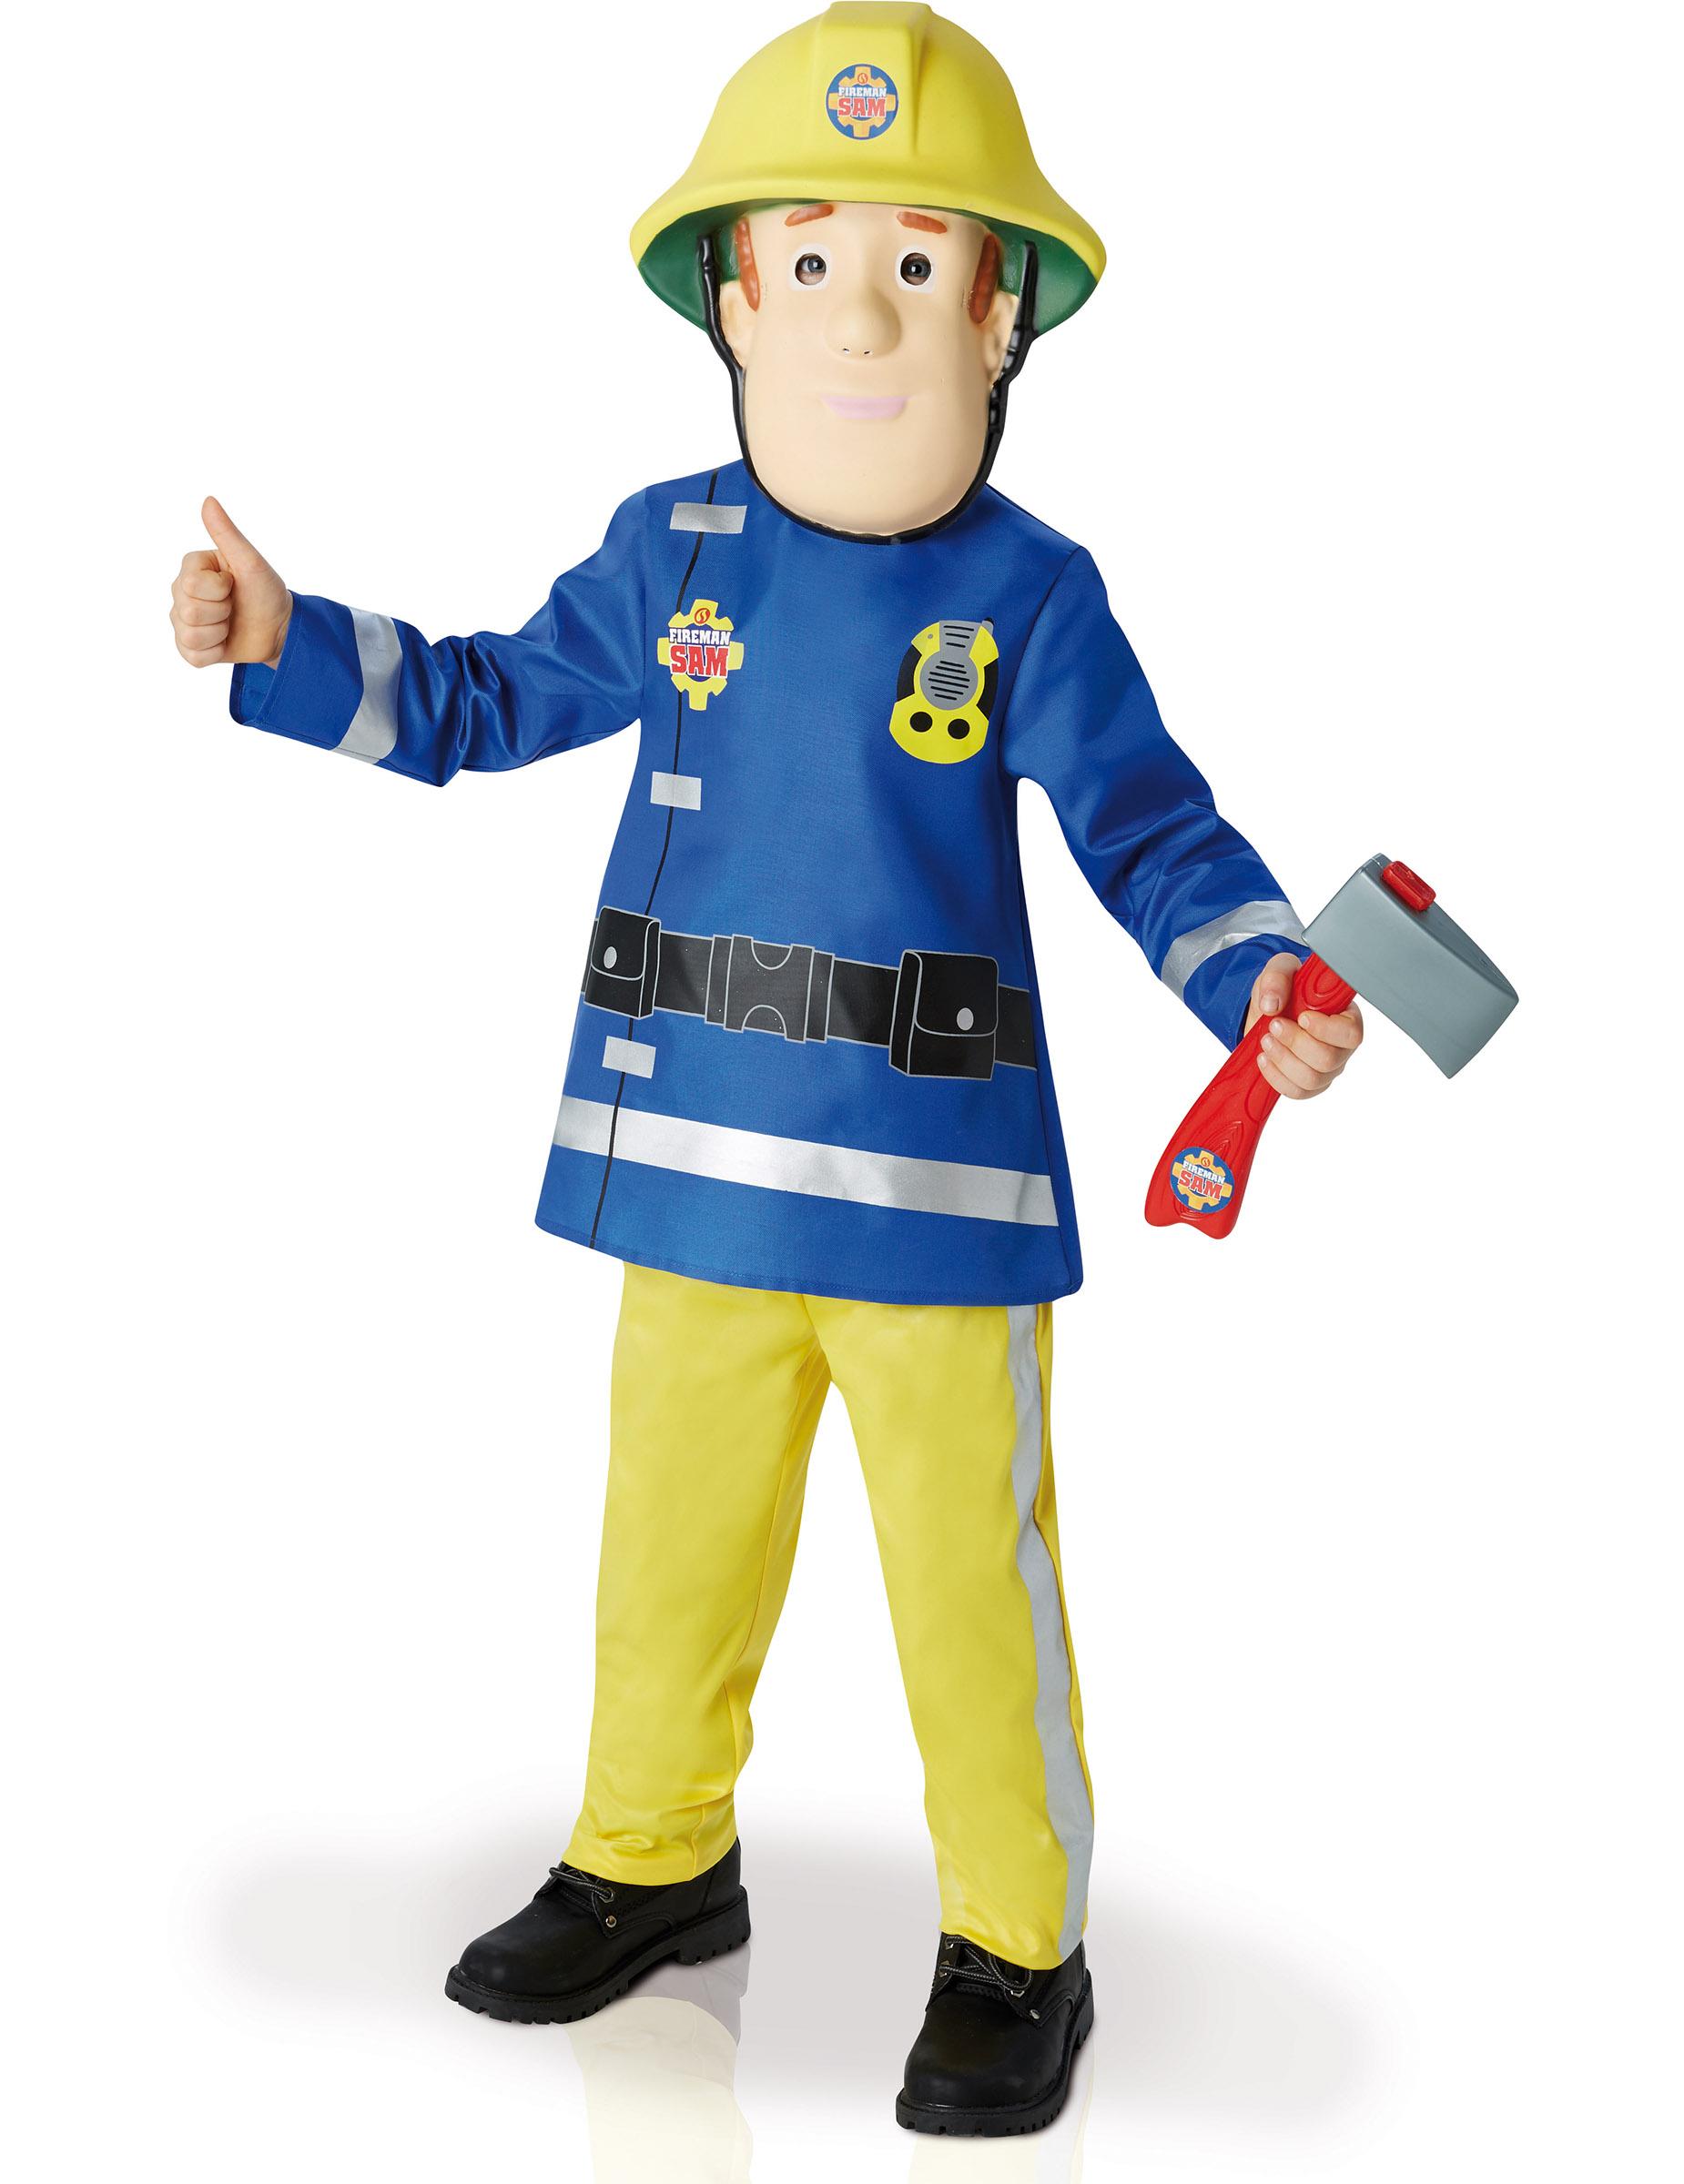 D guisement luxe sam le pompier gar on deguise toi - Sam le pompier noel ...